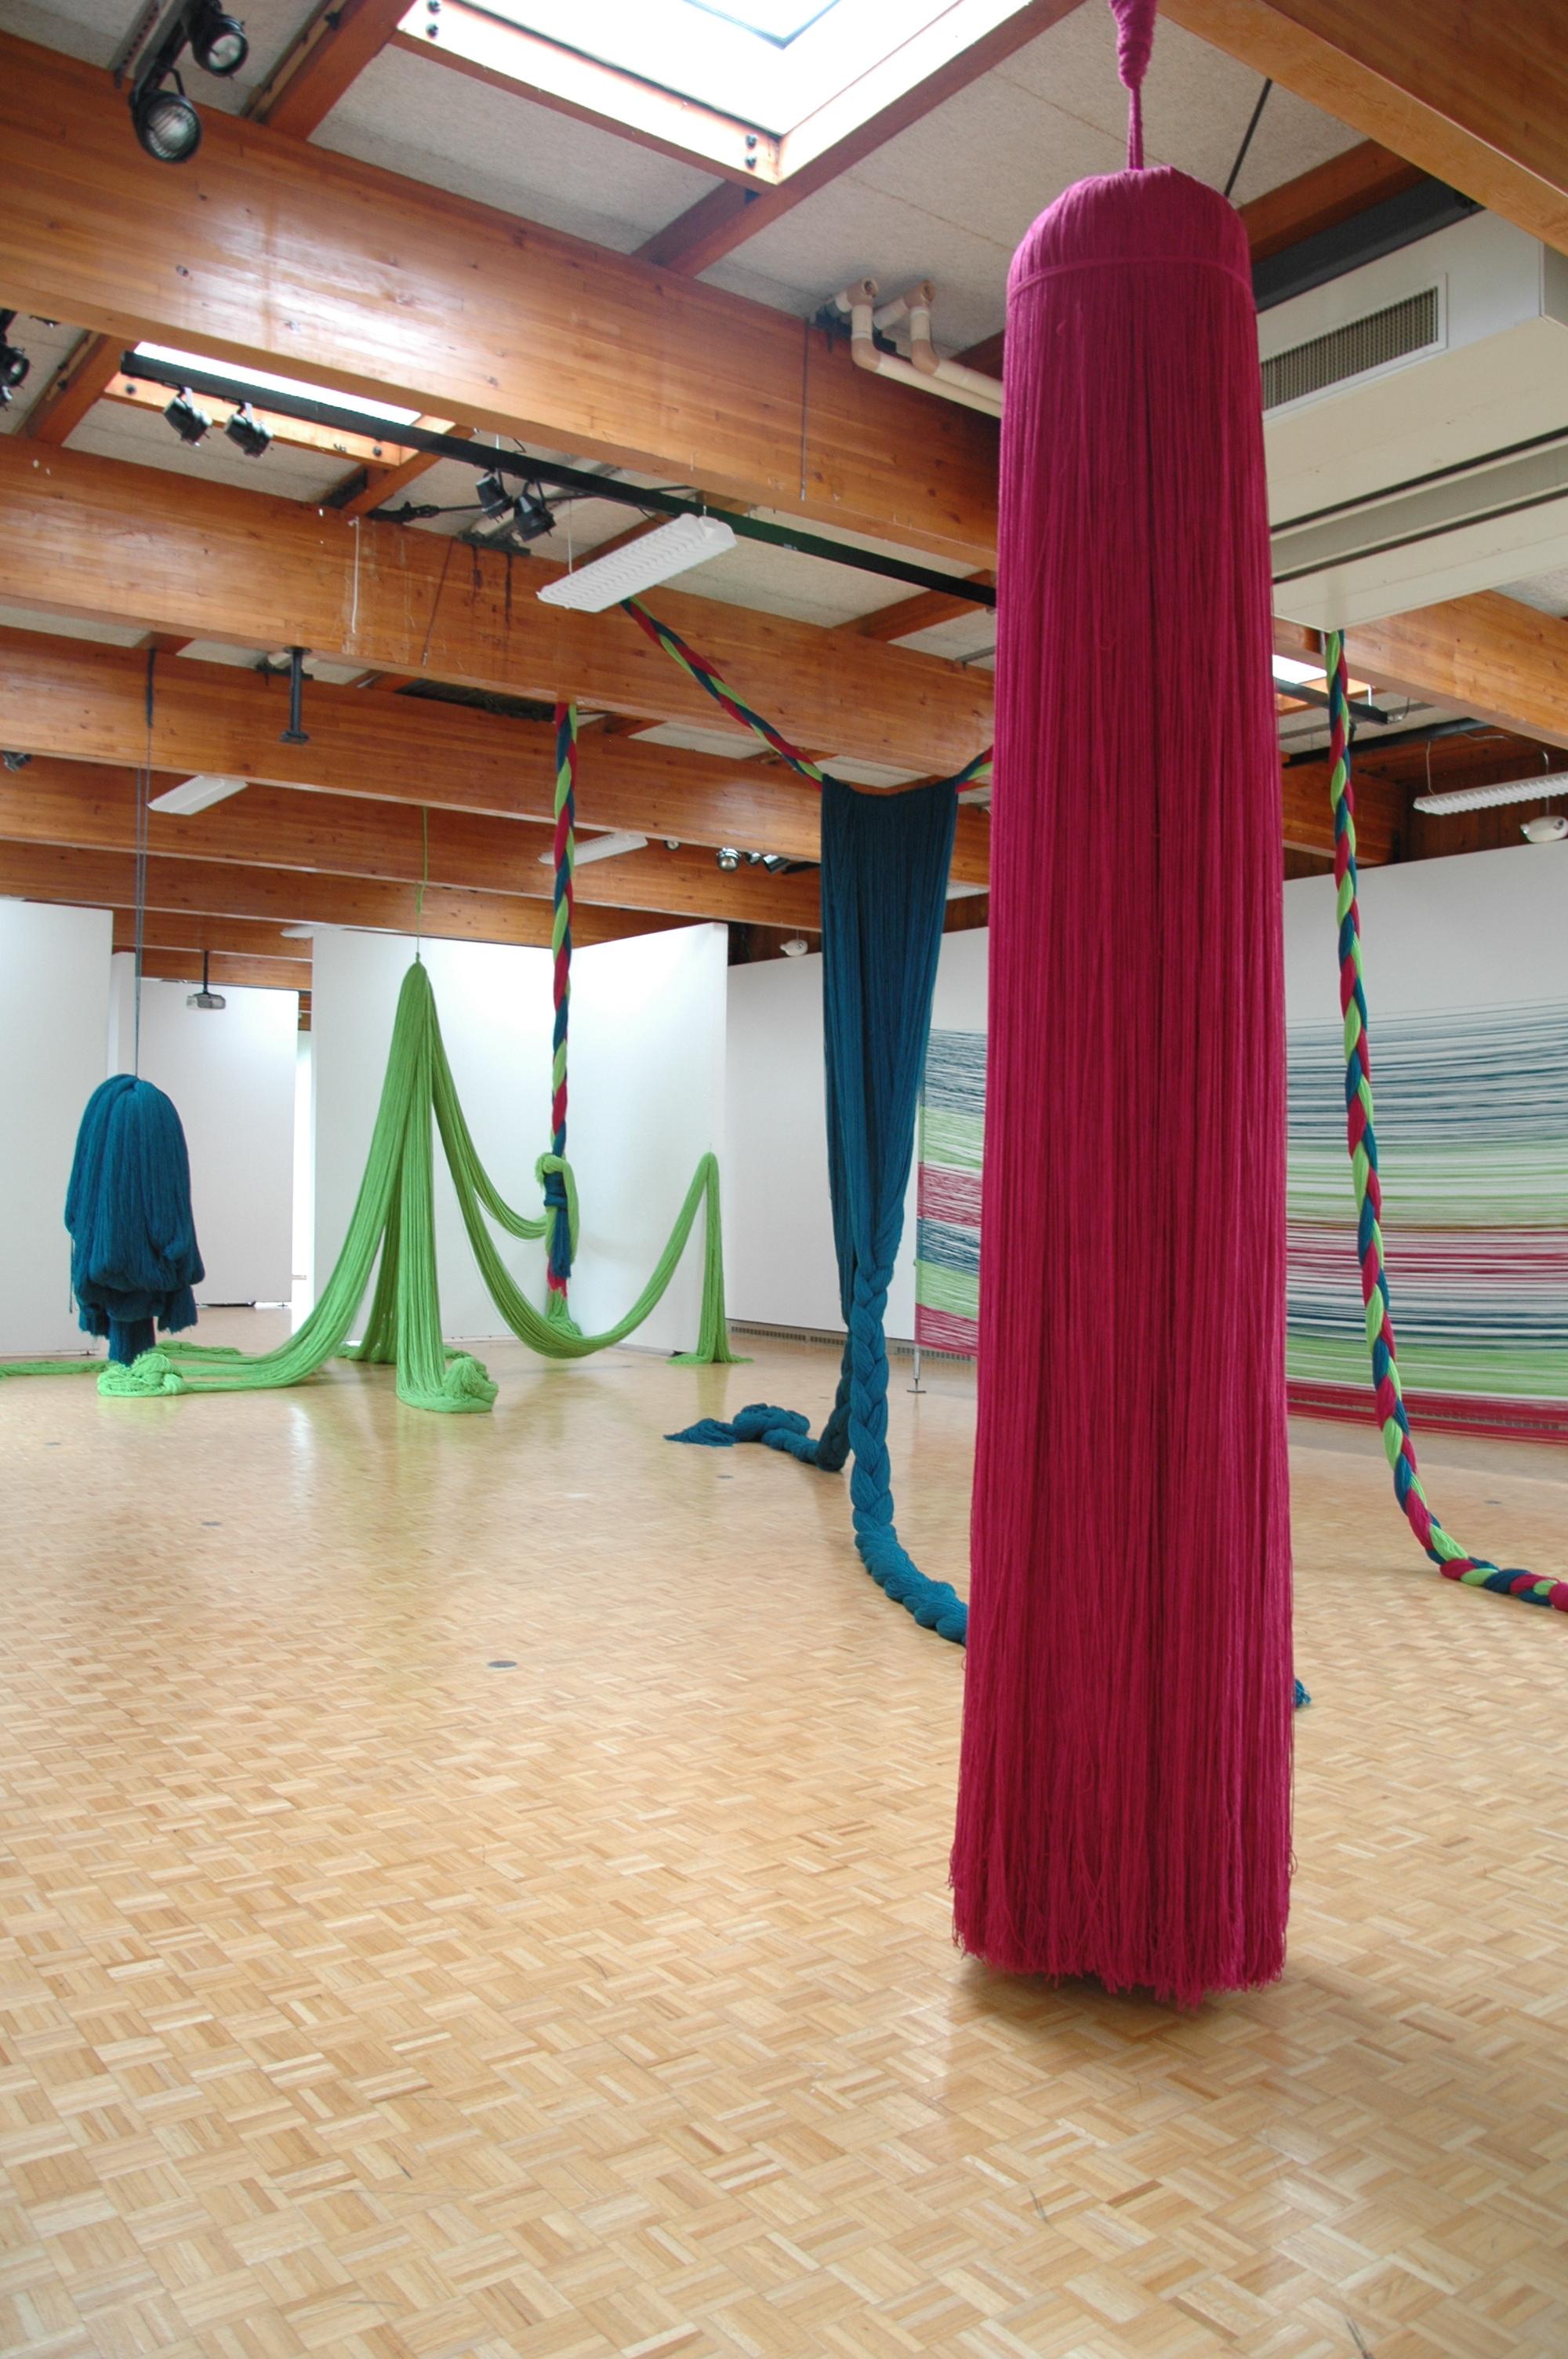 A Work in Progress: TRIM (Installation at Usdan Gallery, Bennington College), 2010, Acrylic yarn, 14' x 40' x 80' (Installation with video)